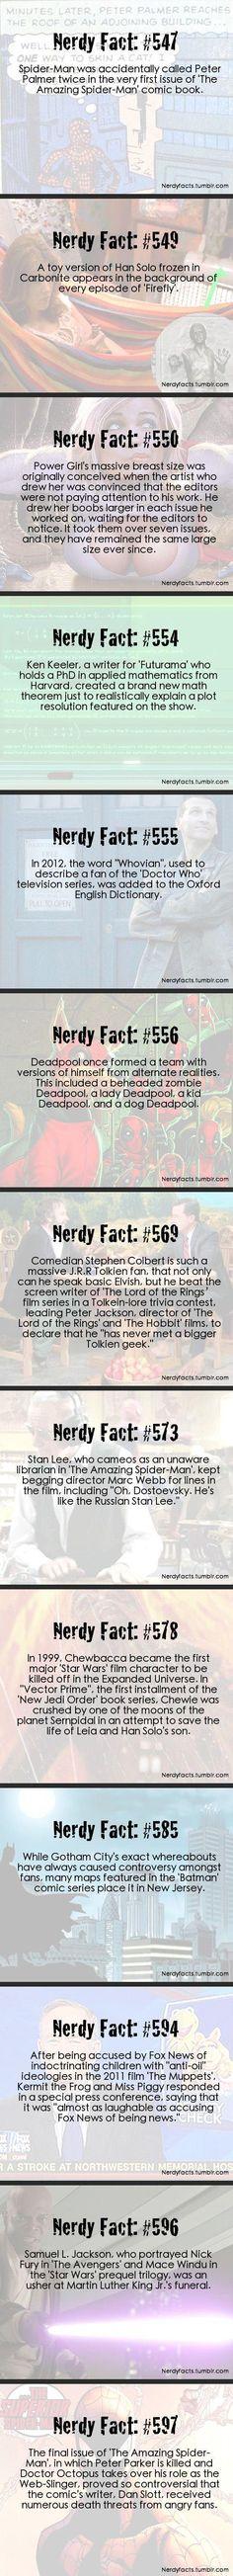 Nerd Facts